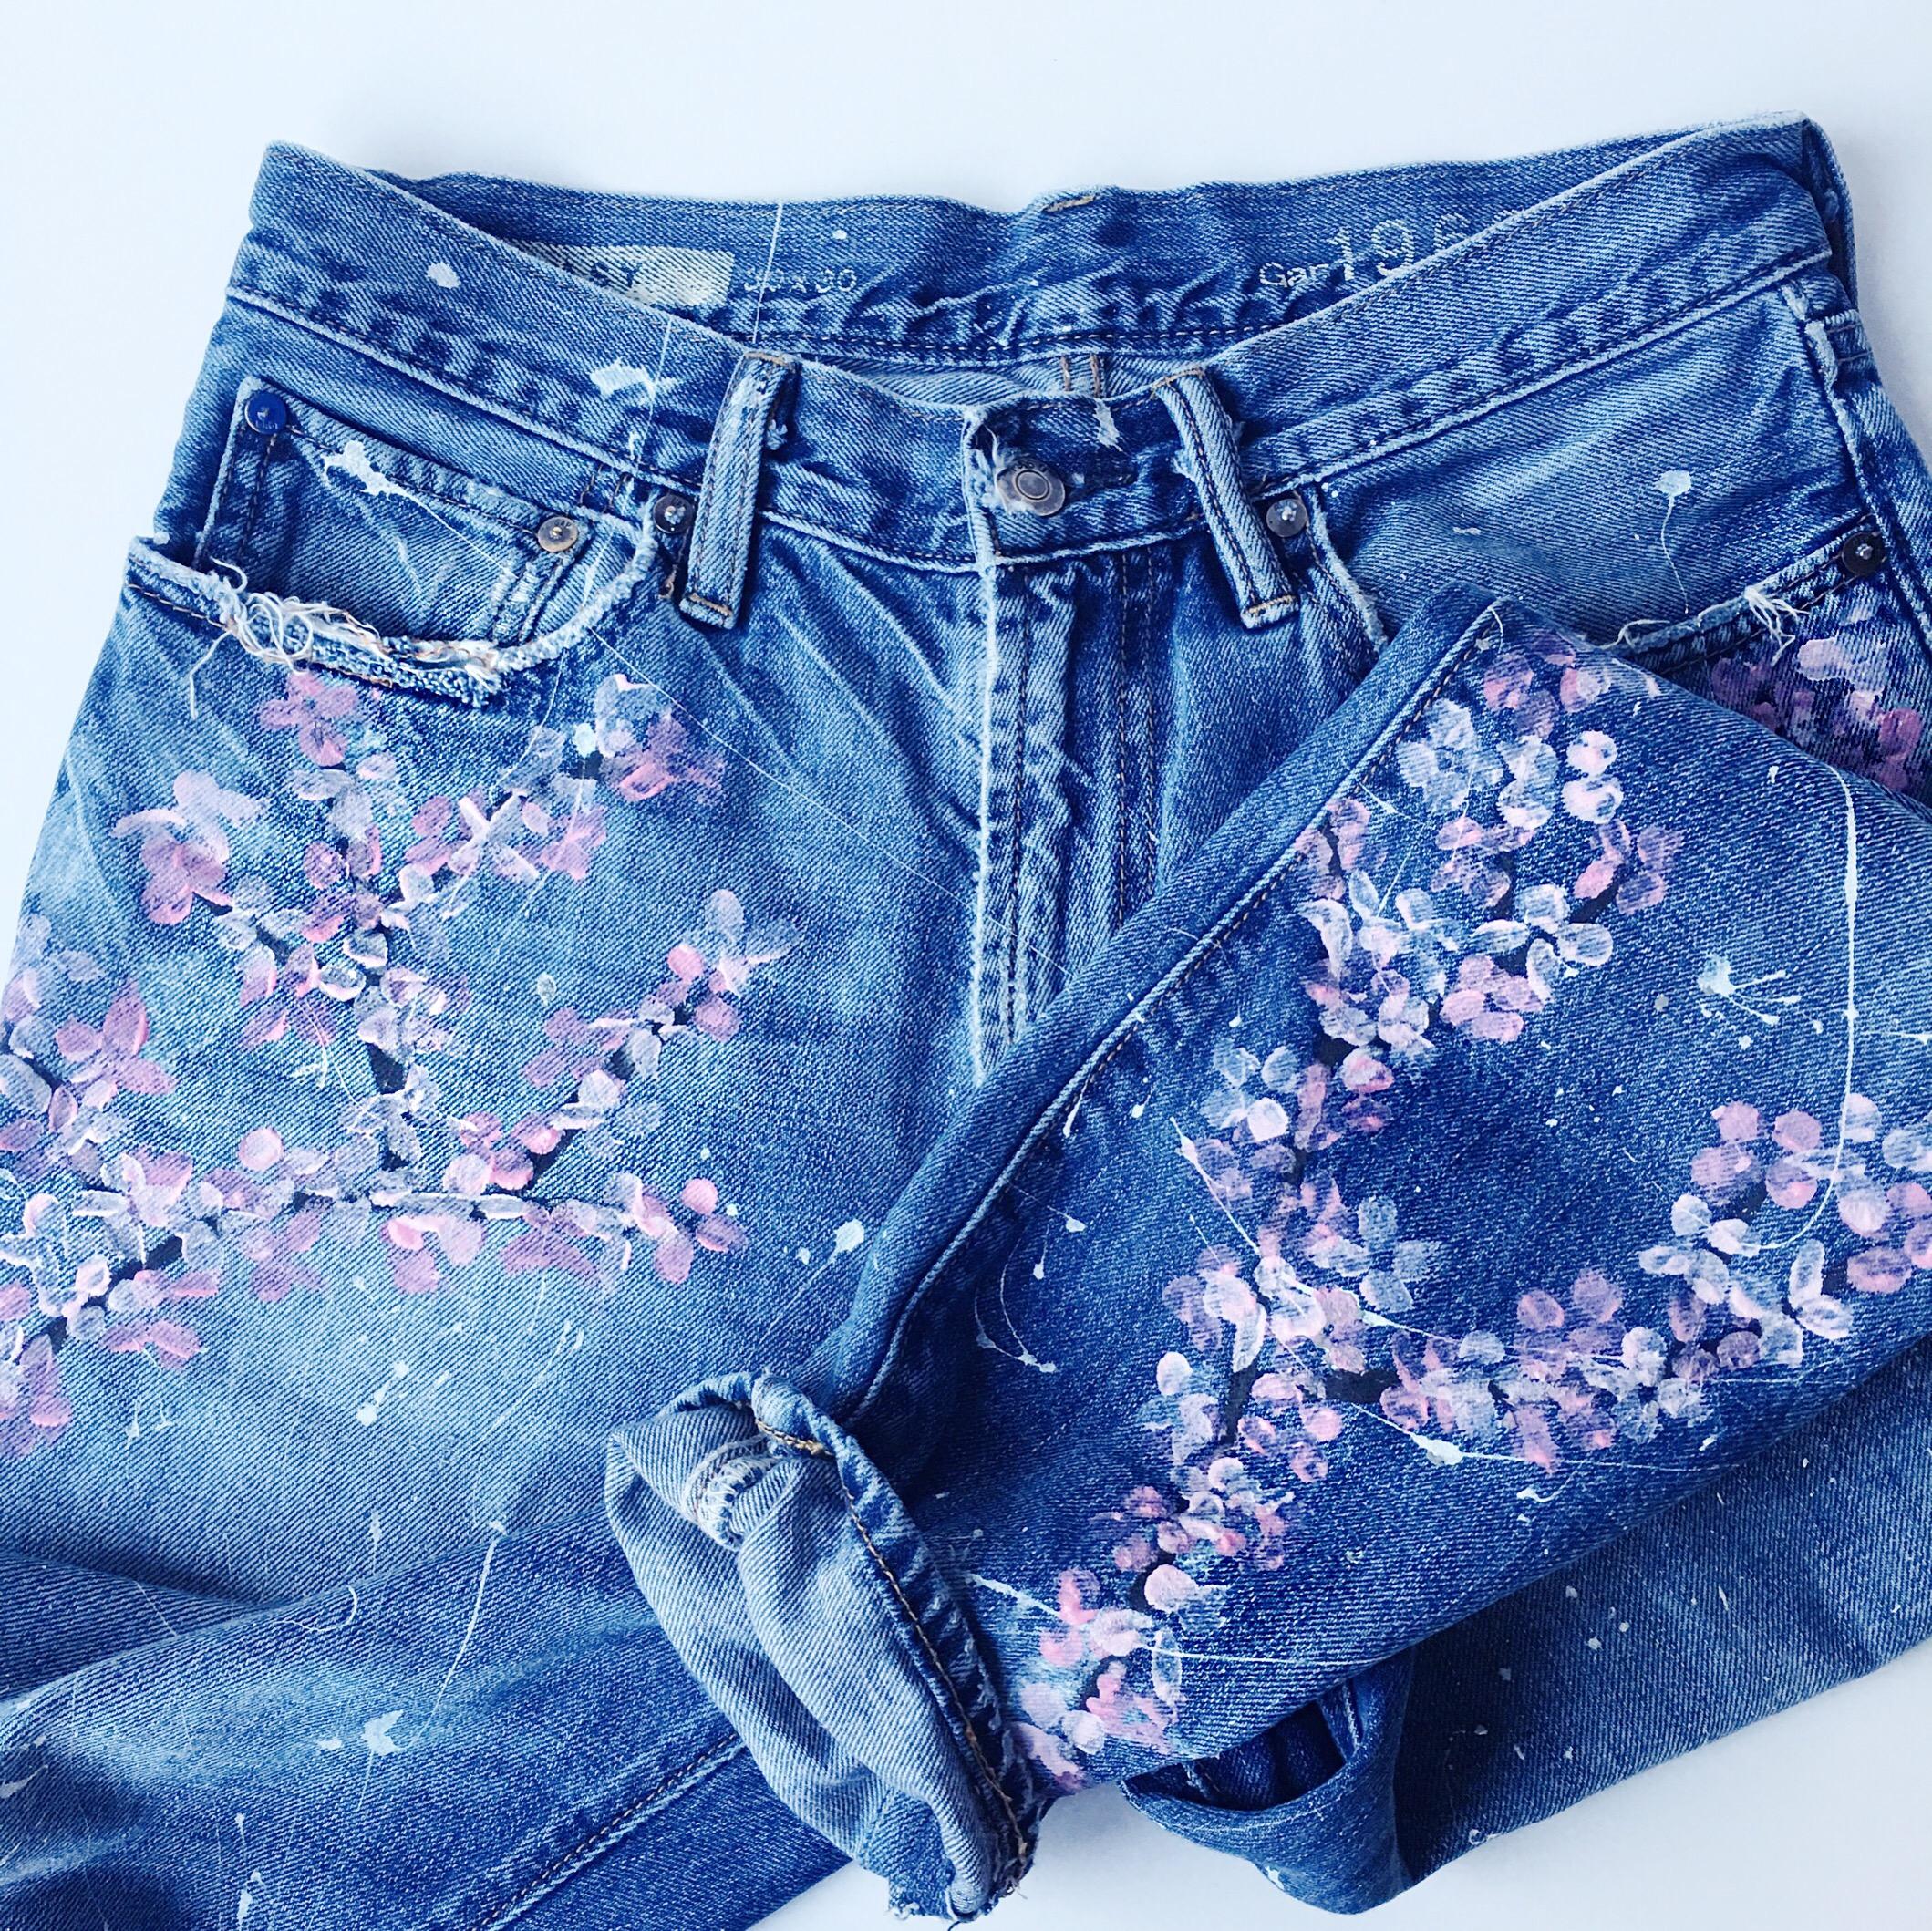 Diy Floral Boyfriend Jeans